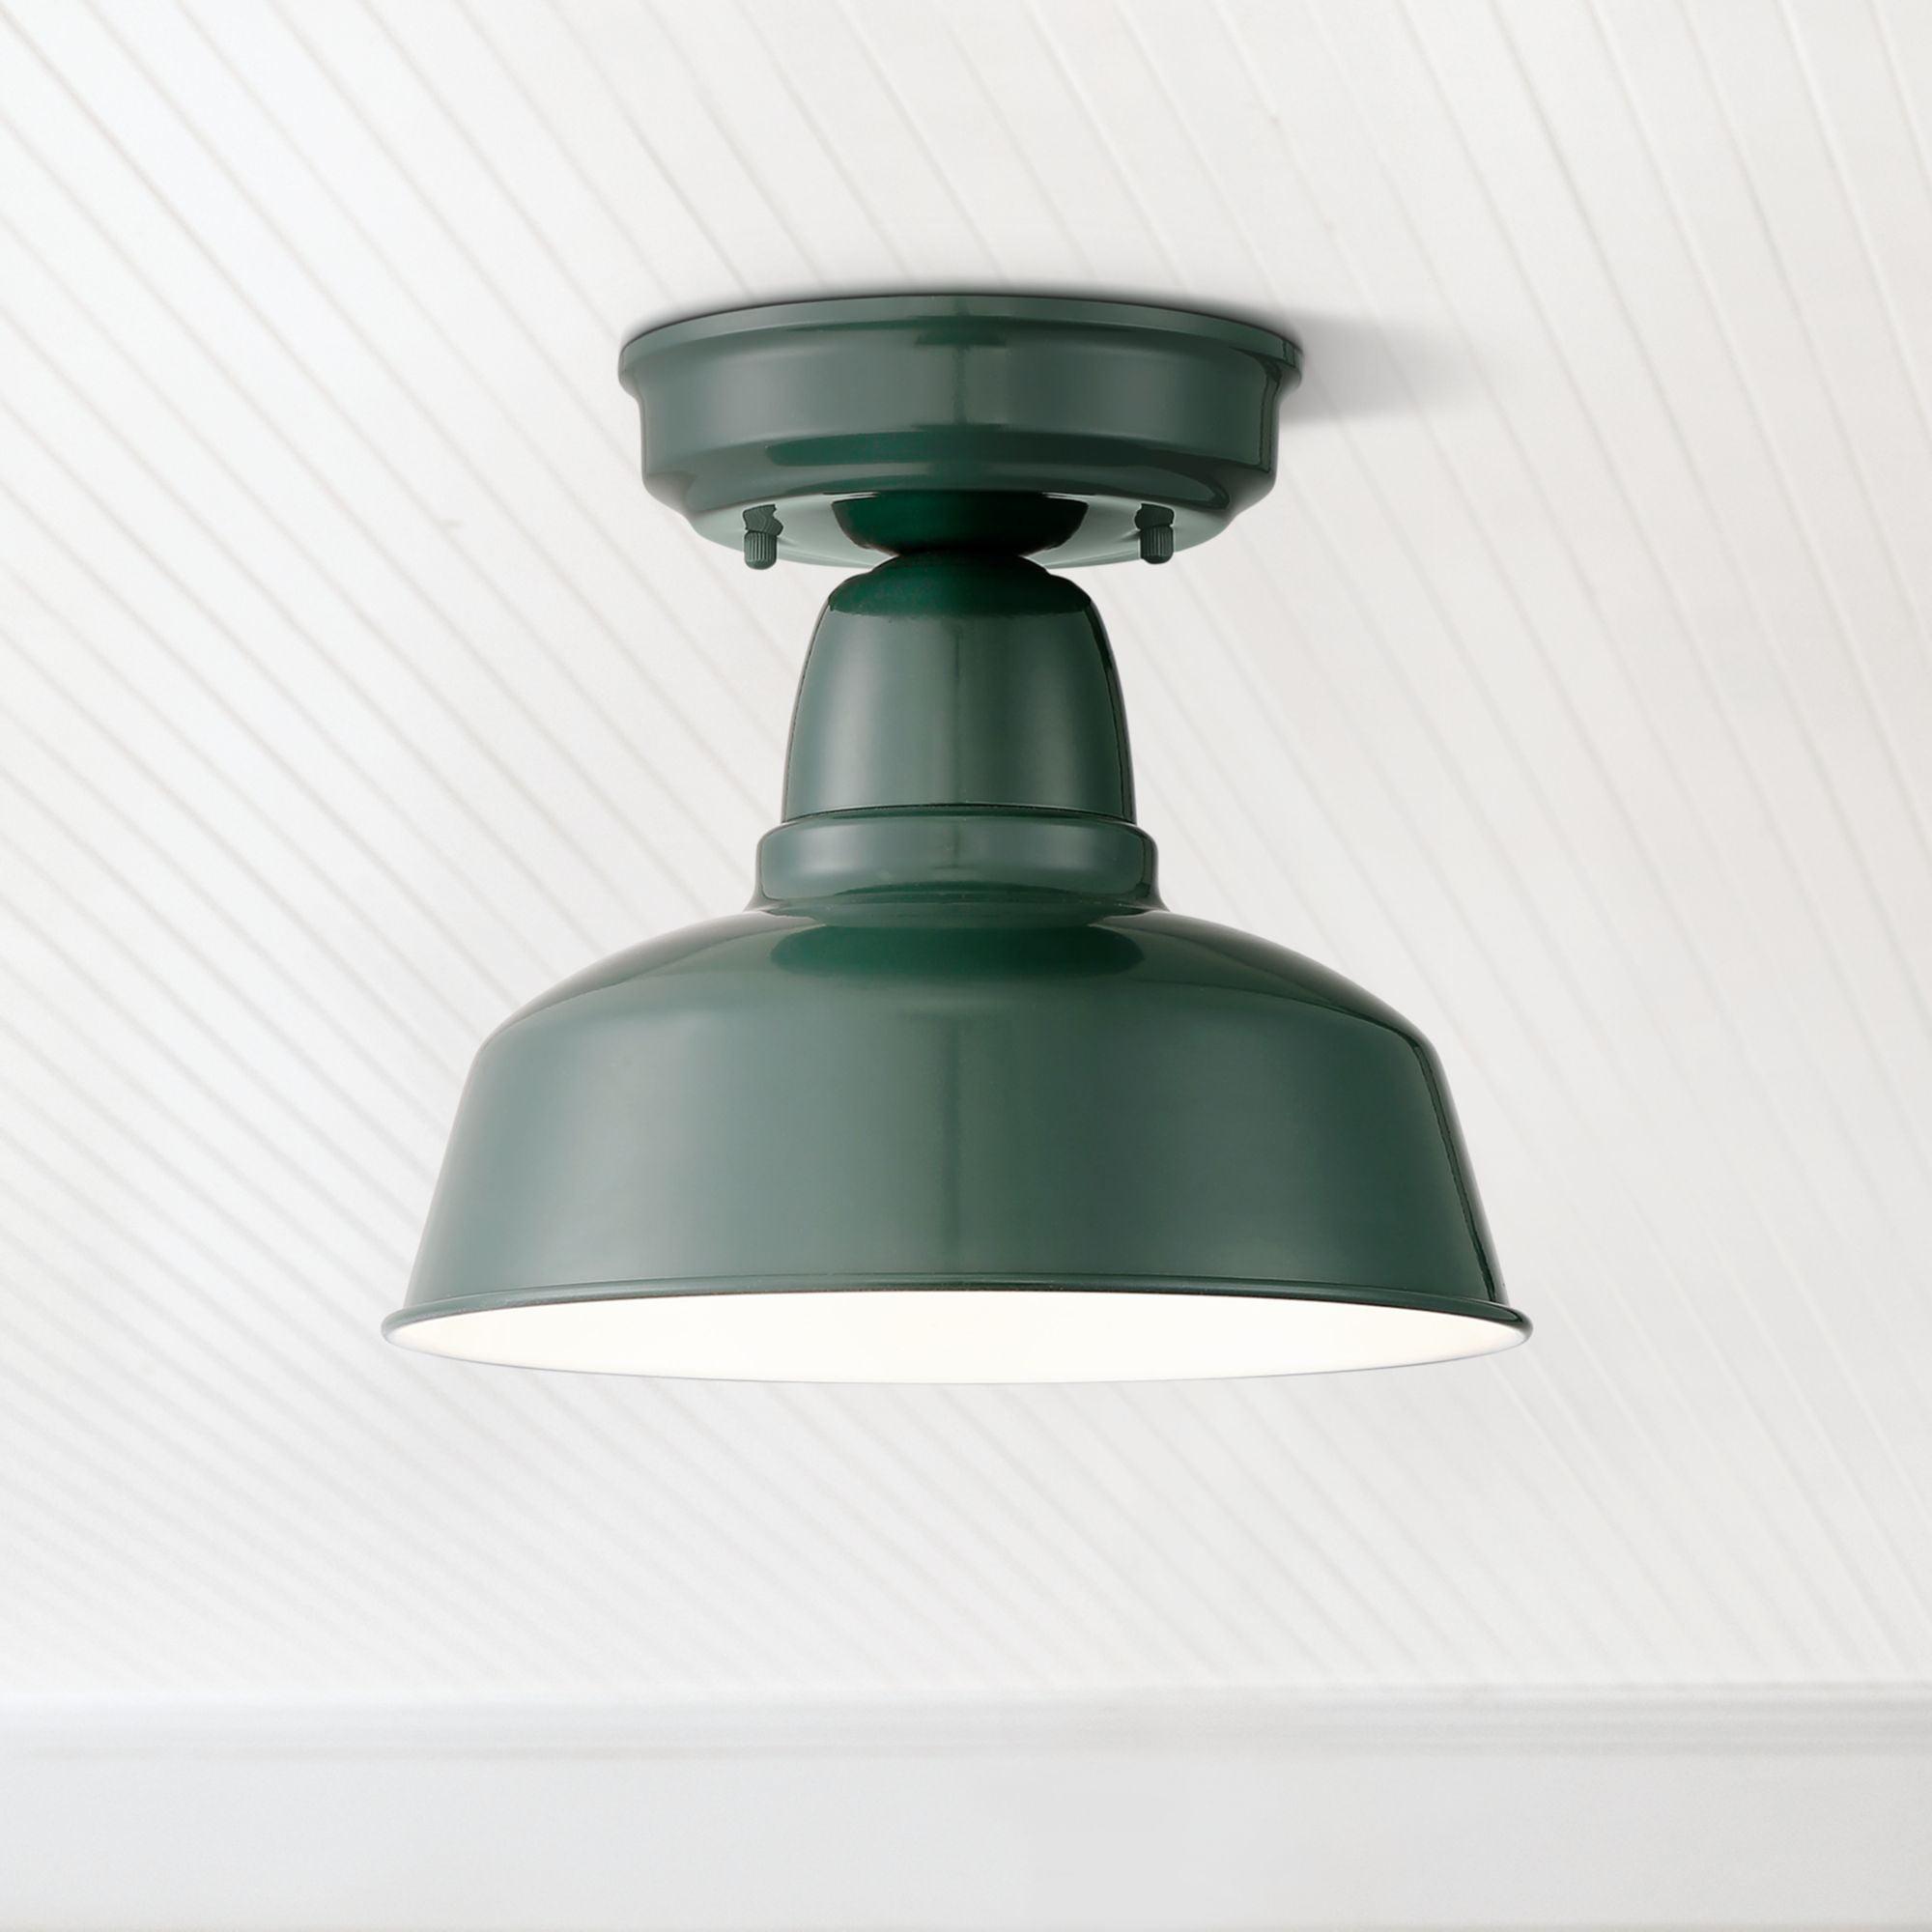 "John Timberland Rustic Outdoor Ceiling Light Fixture Urban Barn Dark Green 10 1/4"" for Exterior House Porch Patio"